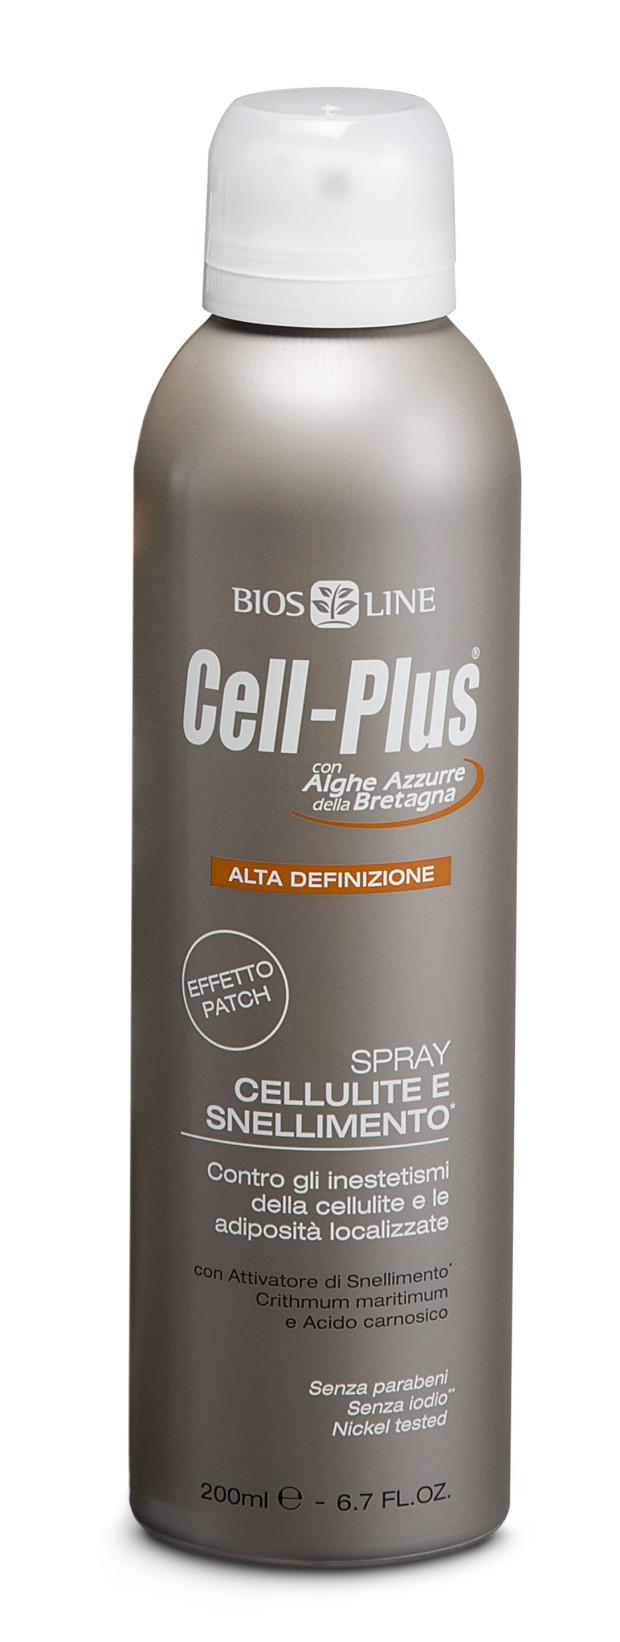 cell-plus-spray-cellulite-snellimento-solo-bombola